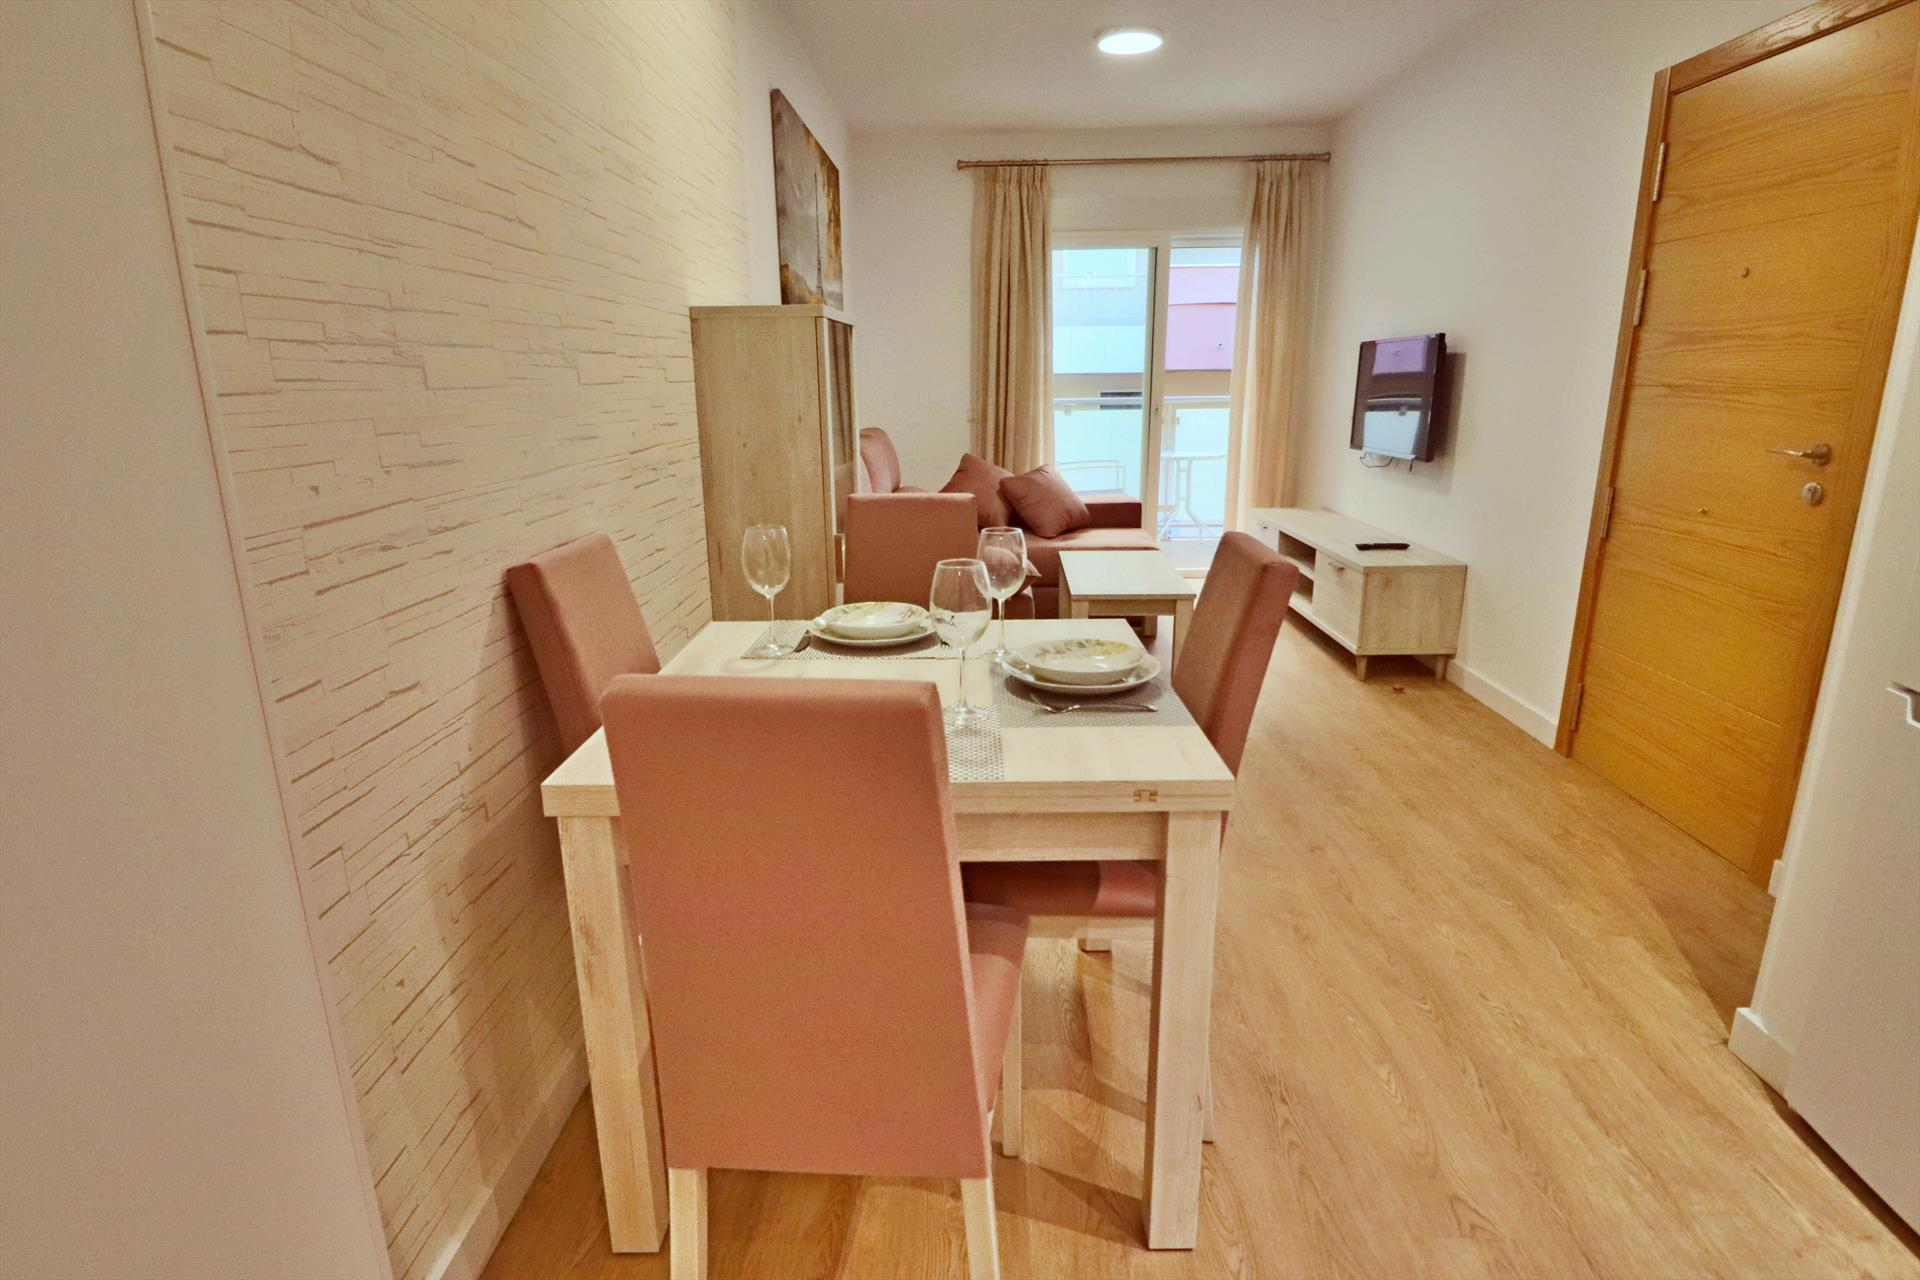 Poeta 1 bedroom apartment ihaep11119,Apartment in Fuengirola, Andalusia, Spain for 2 persons...